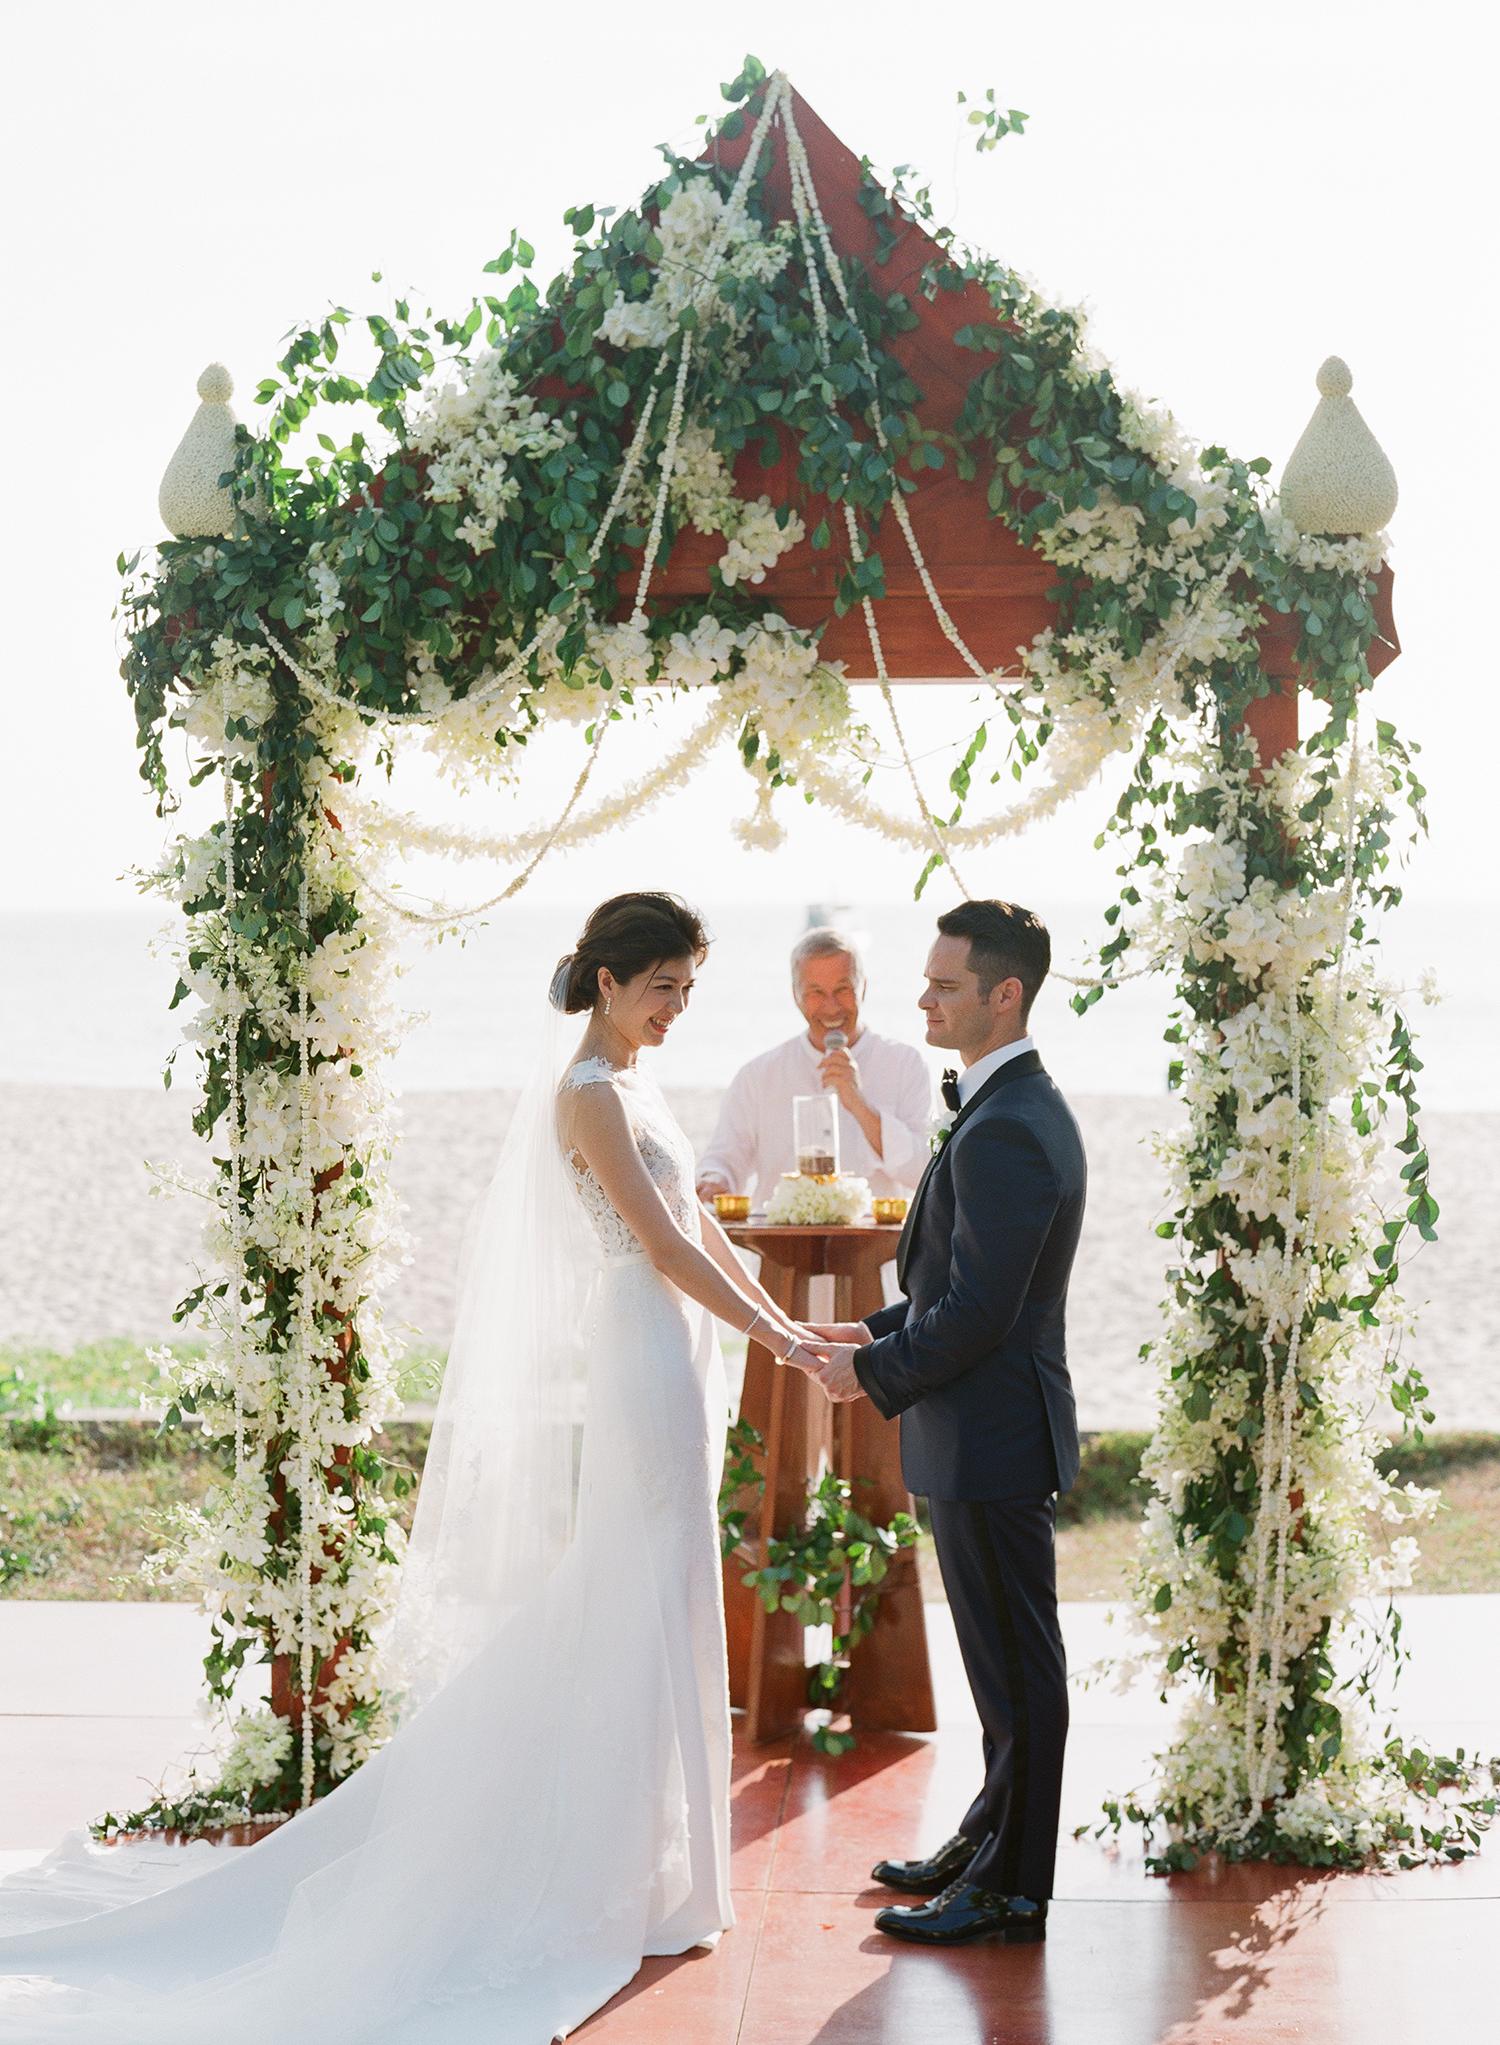 stacy brad wedding ceremony holding hands